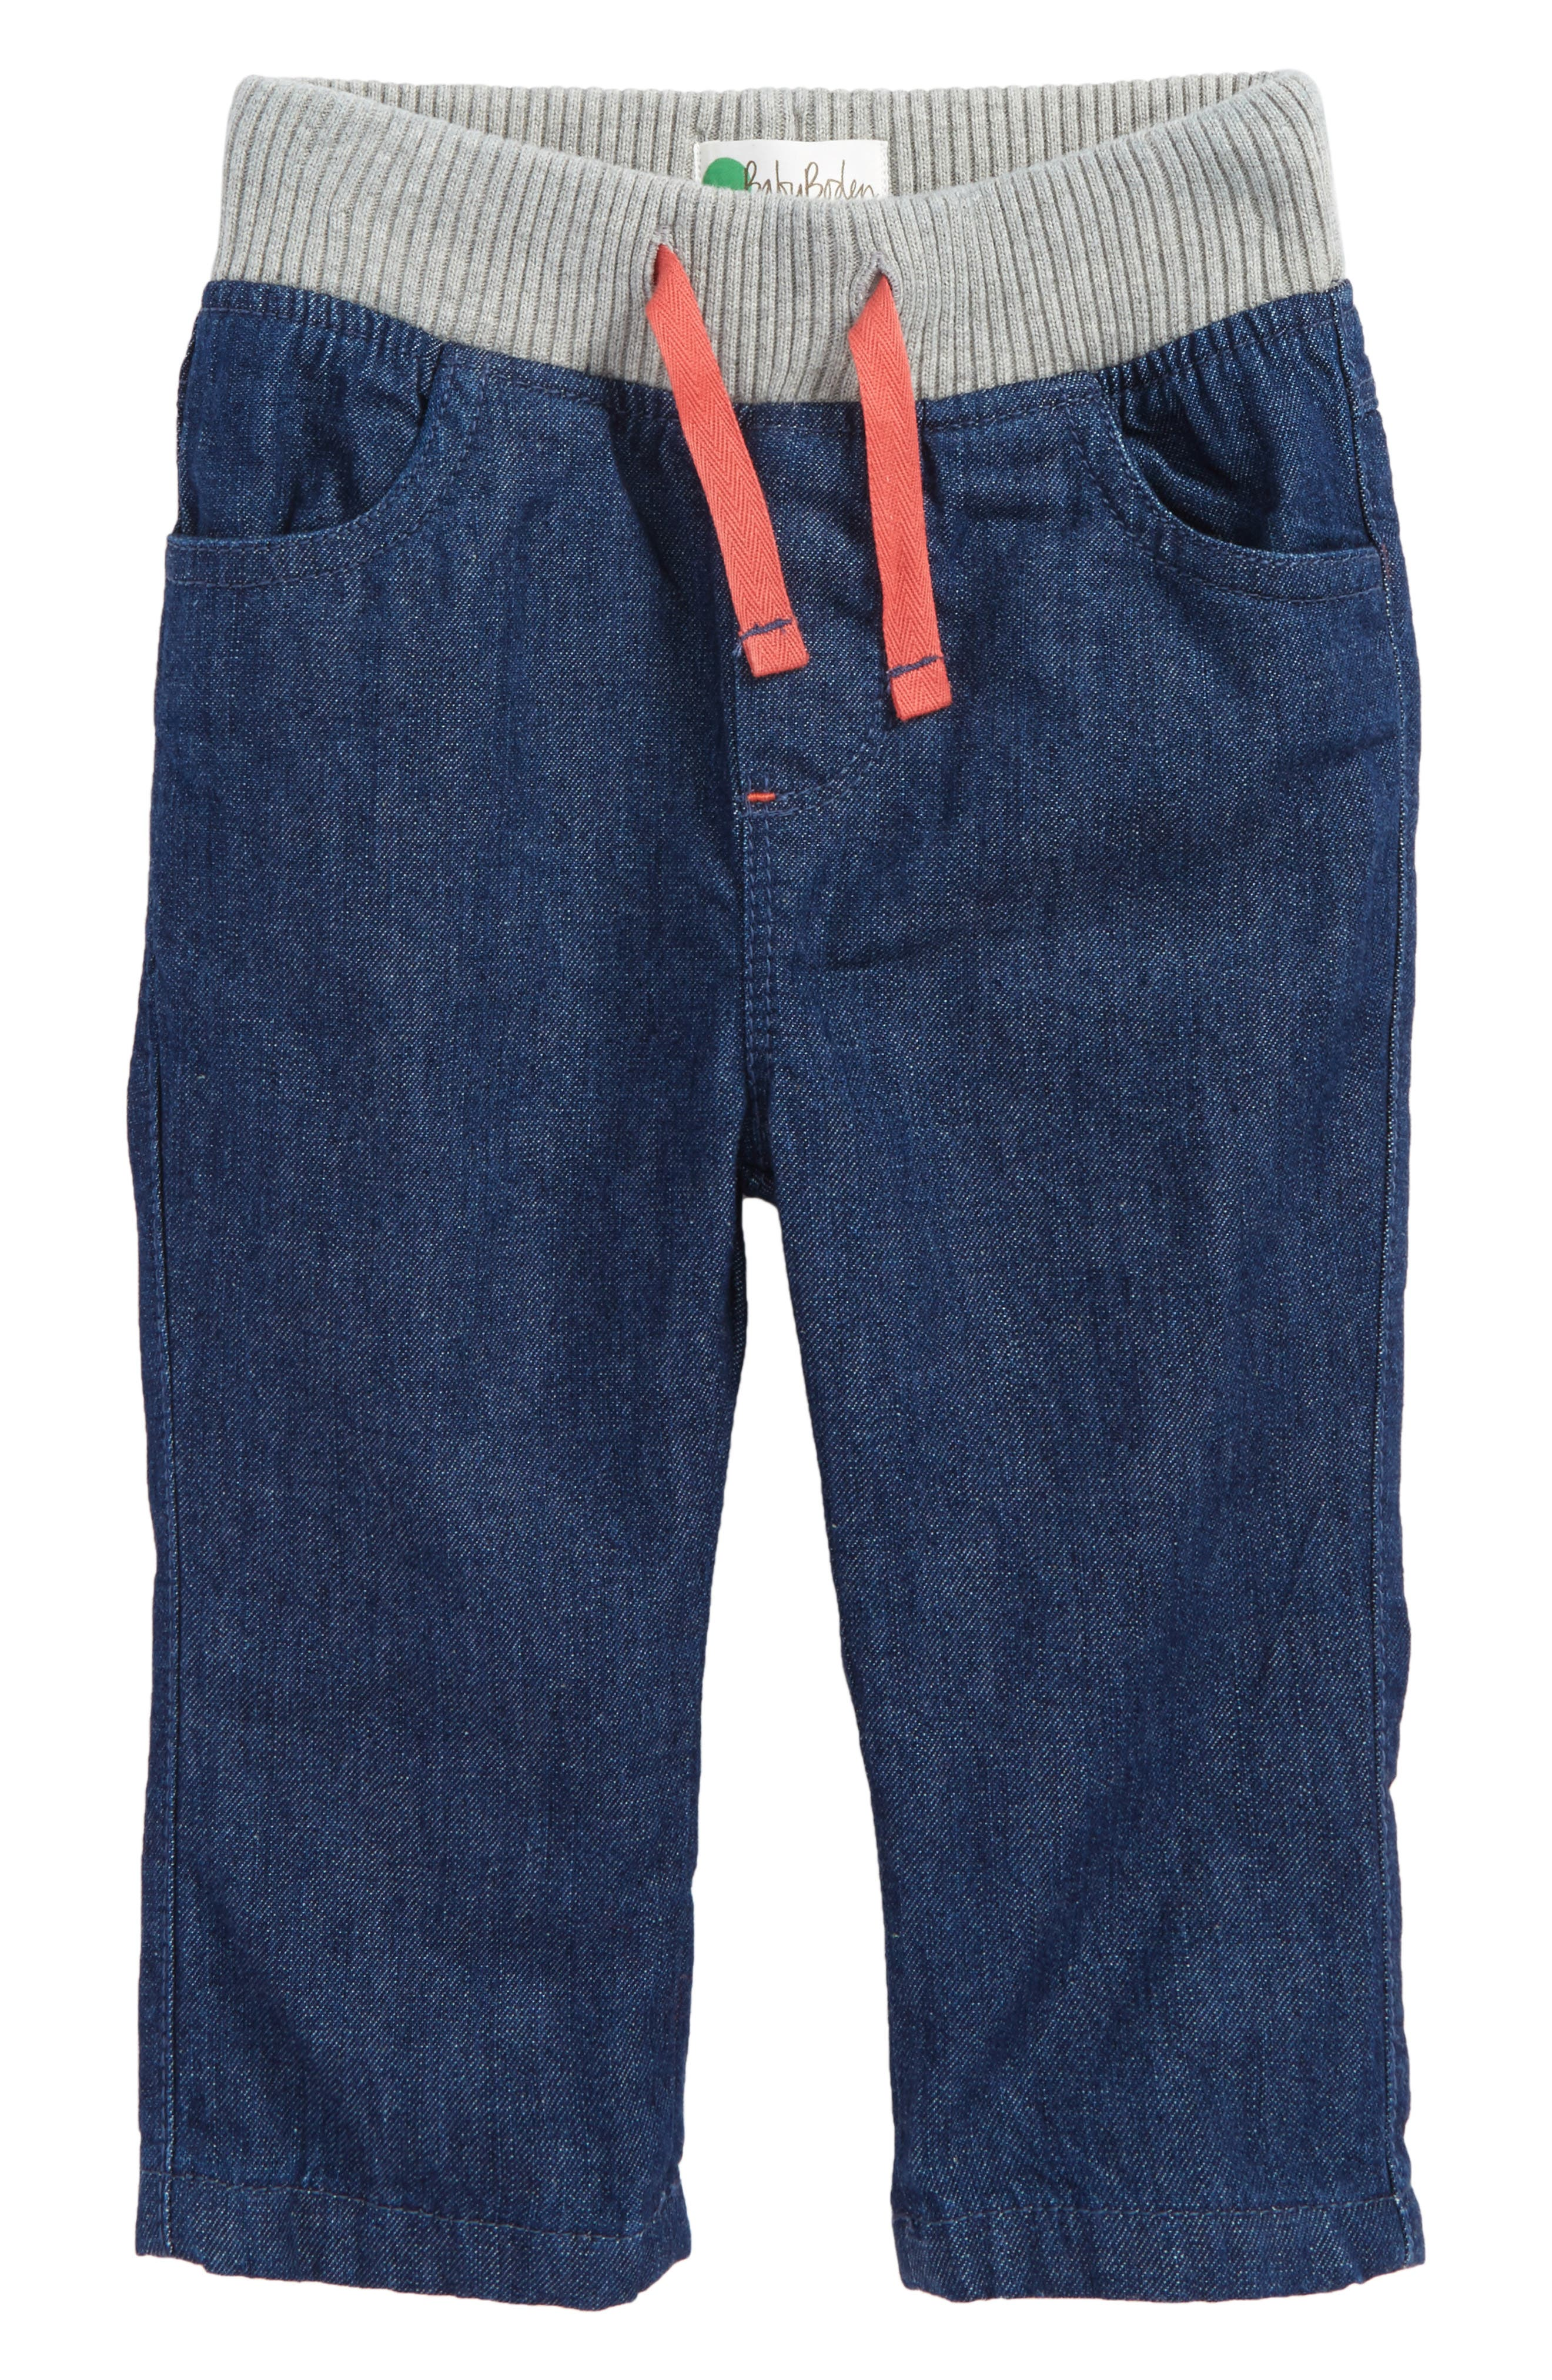 Main Image - Mini Boden Rib Waist Pants (Baby Boys & Toddler Boys)